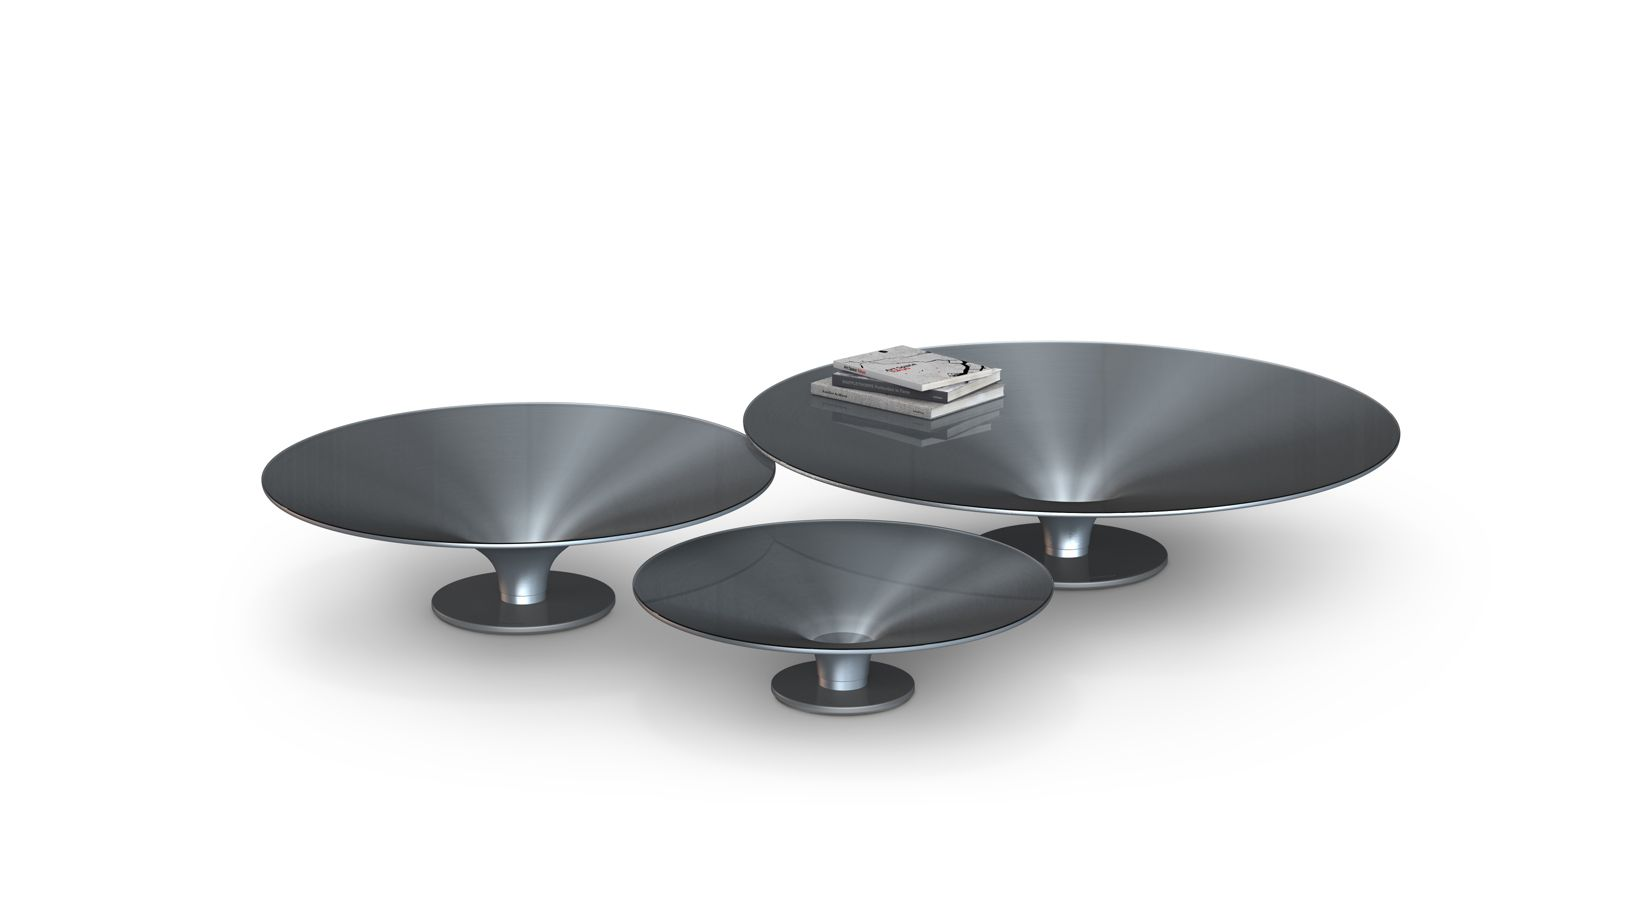 Table Roche Bobois Ovni Basse Ovni k8nNX0wOP